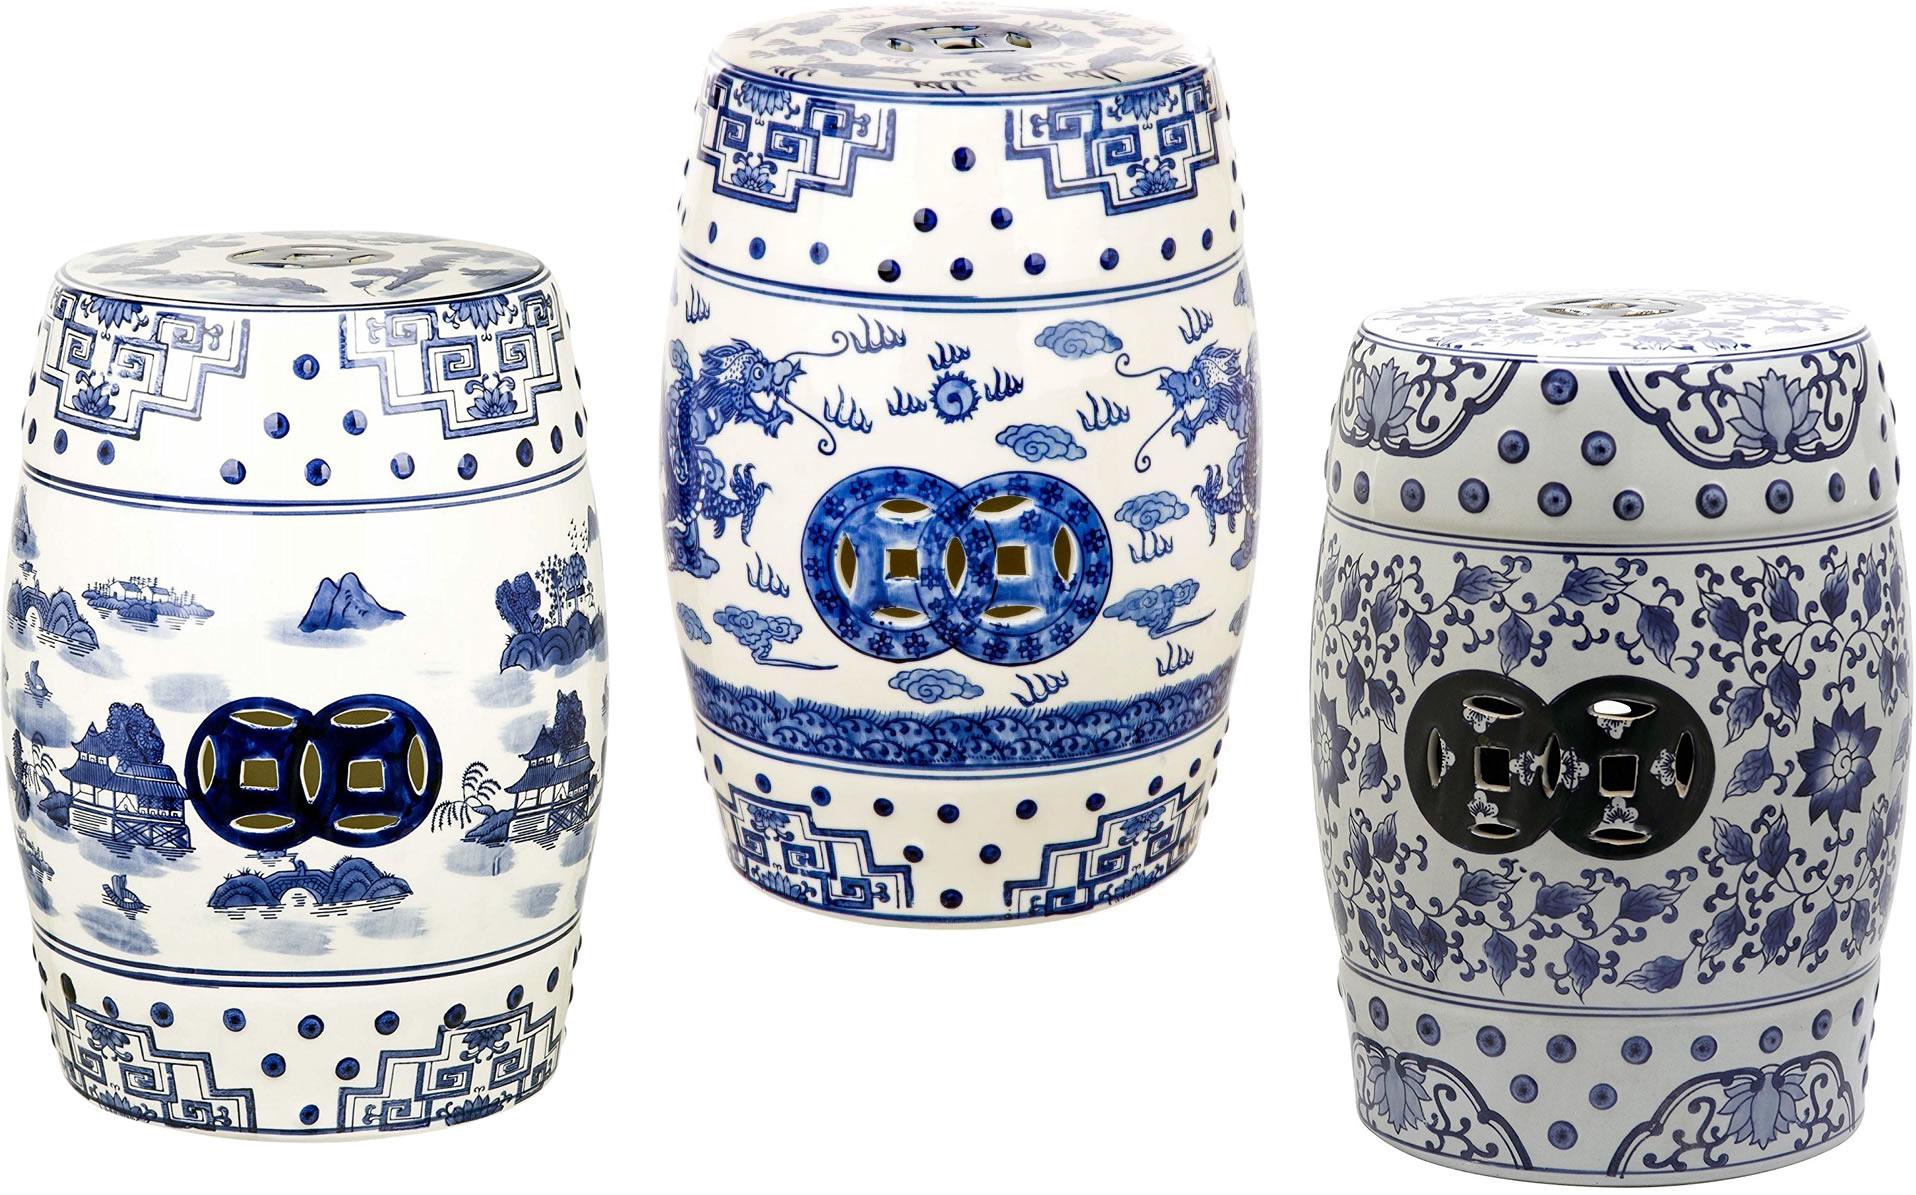 Safavieh Castle Gardens Glazed Ceramic Blue Chinoiserie Garden Stools